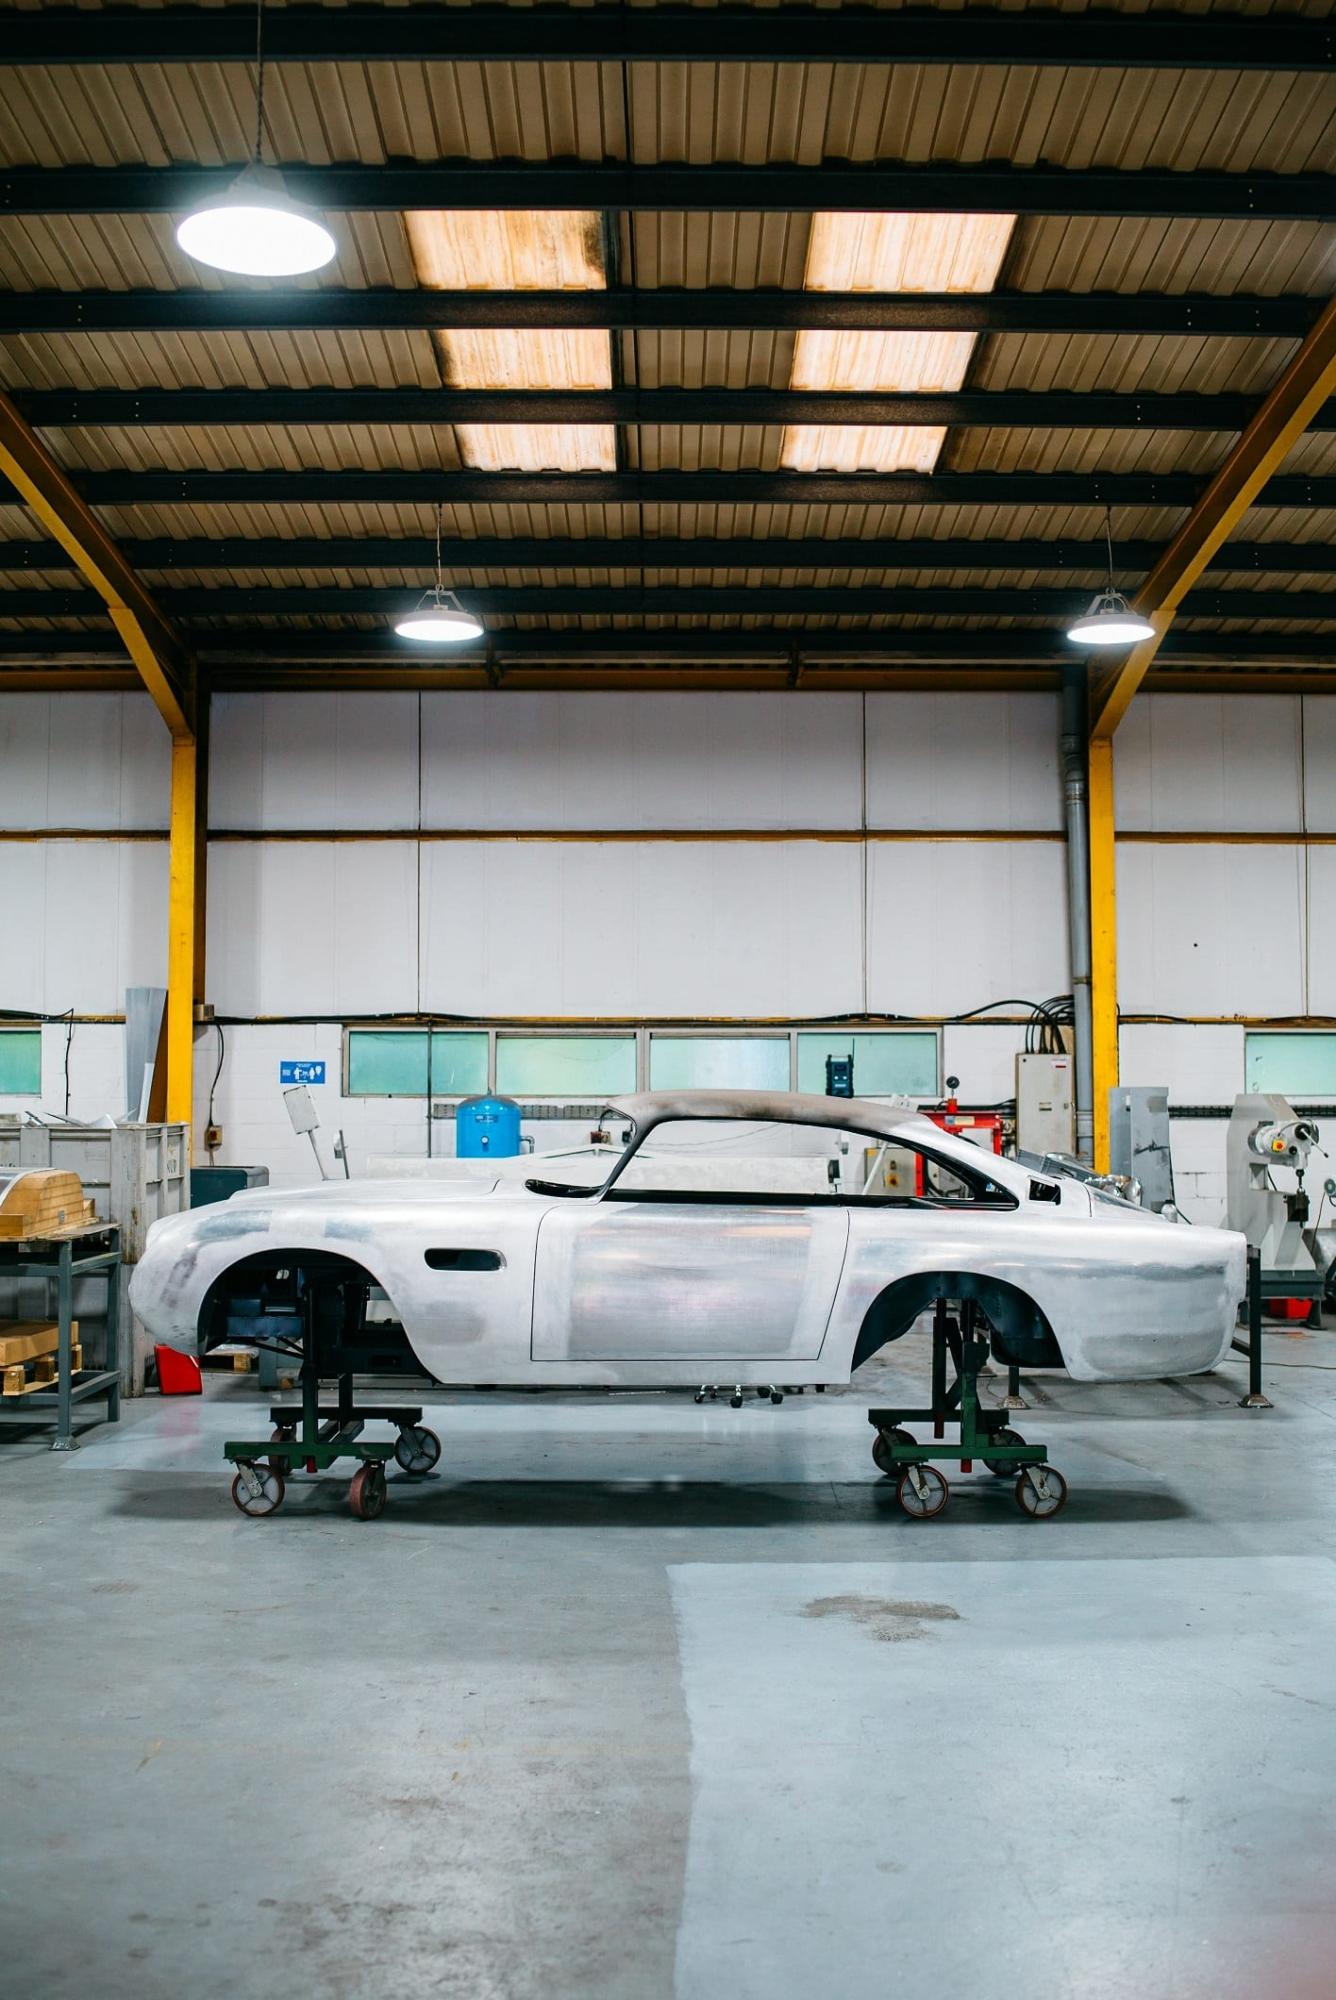 Aston Martin DB5 GYV435C - Bodywork October 2020